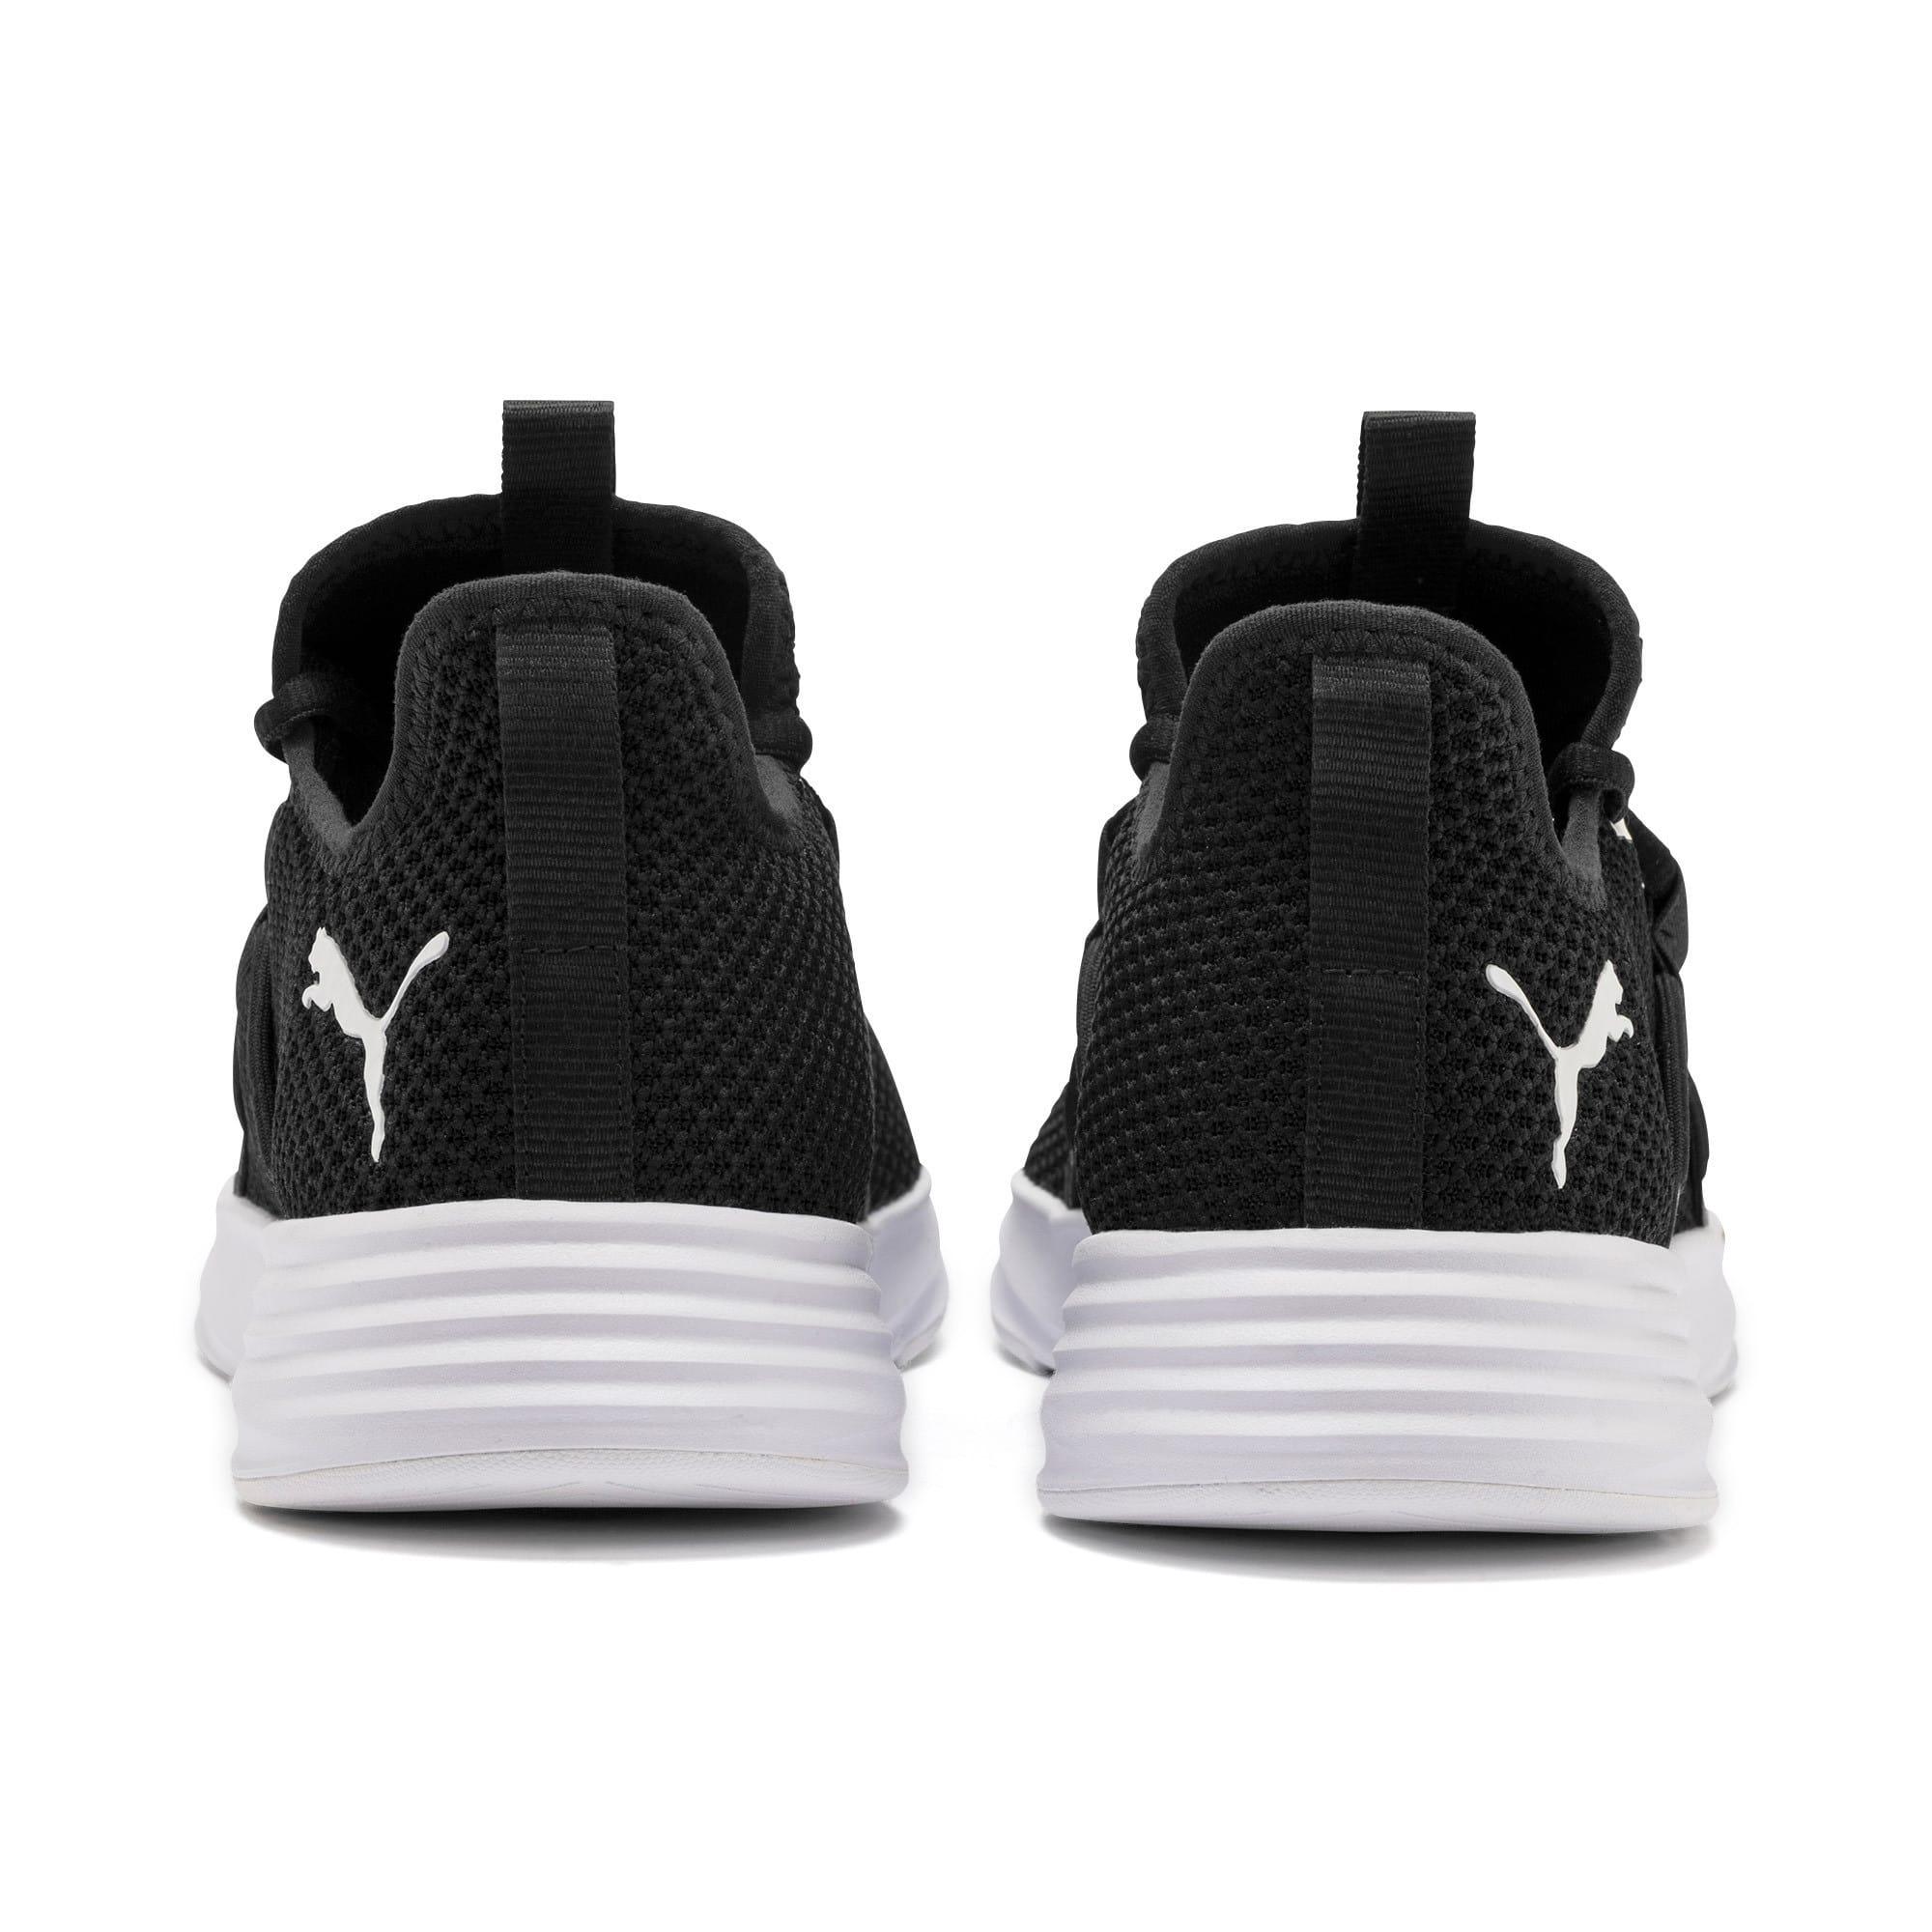 Thumbnail 4 of Persist XT Knit Men's Training Shoes, Puma Black-Puma White, medium